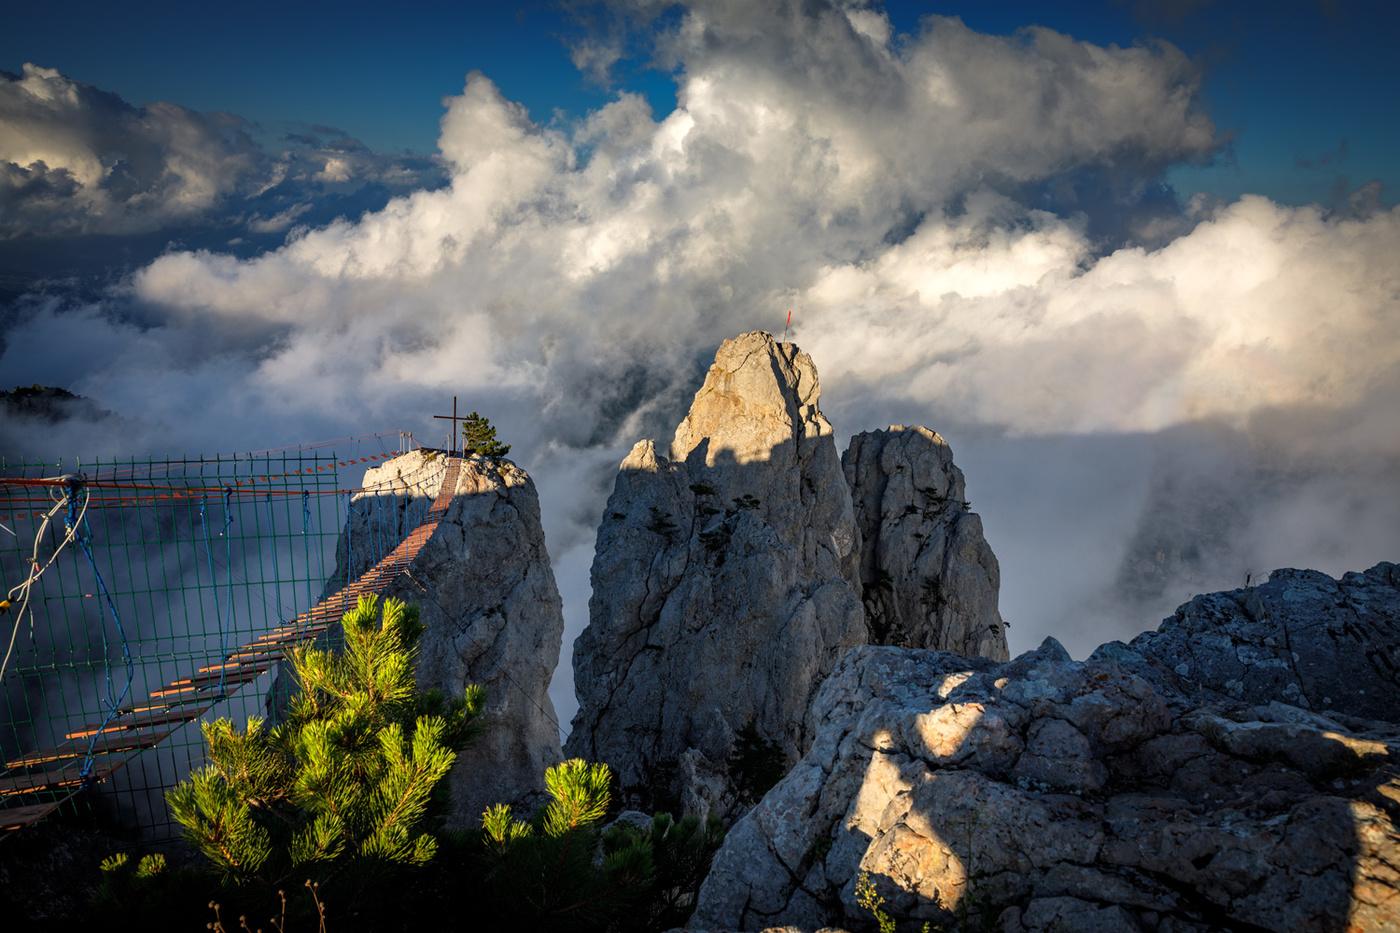 На плато Ай-Петри из-за тумана заблудились туристы